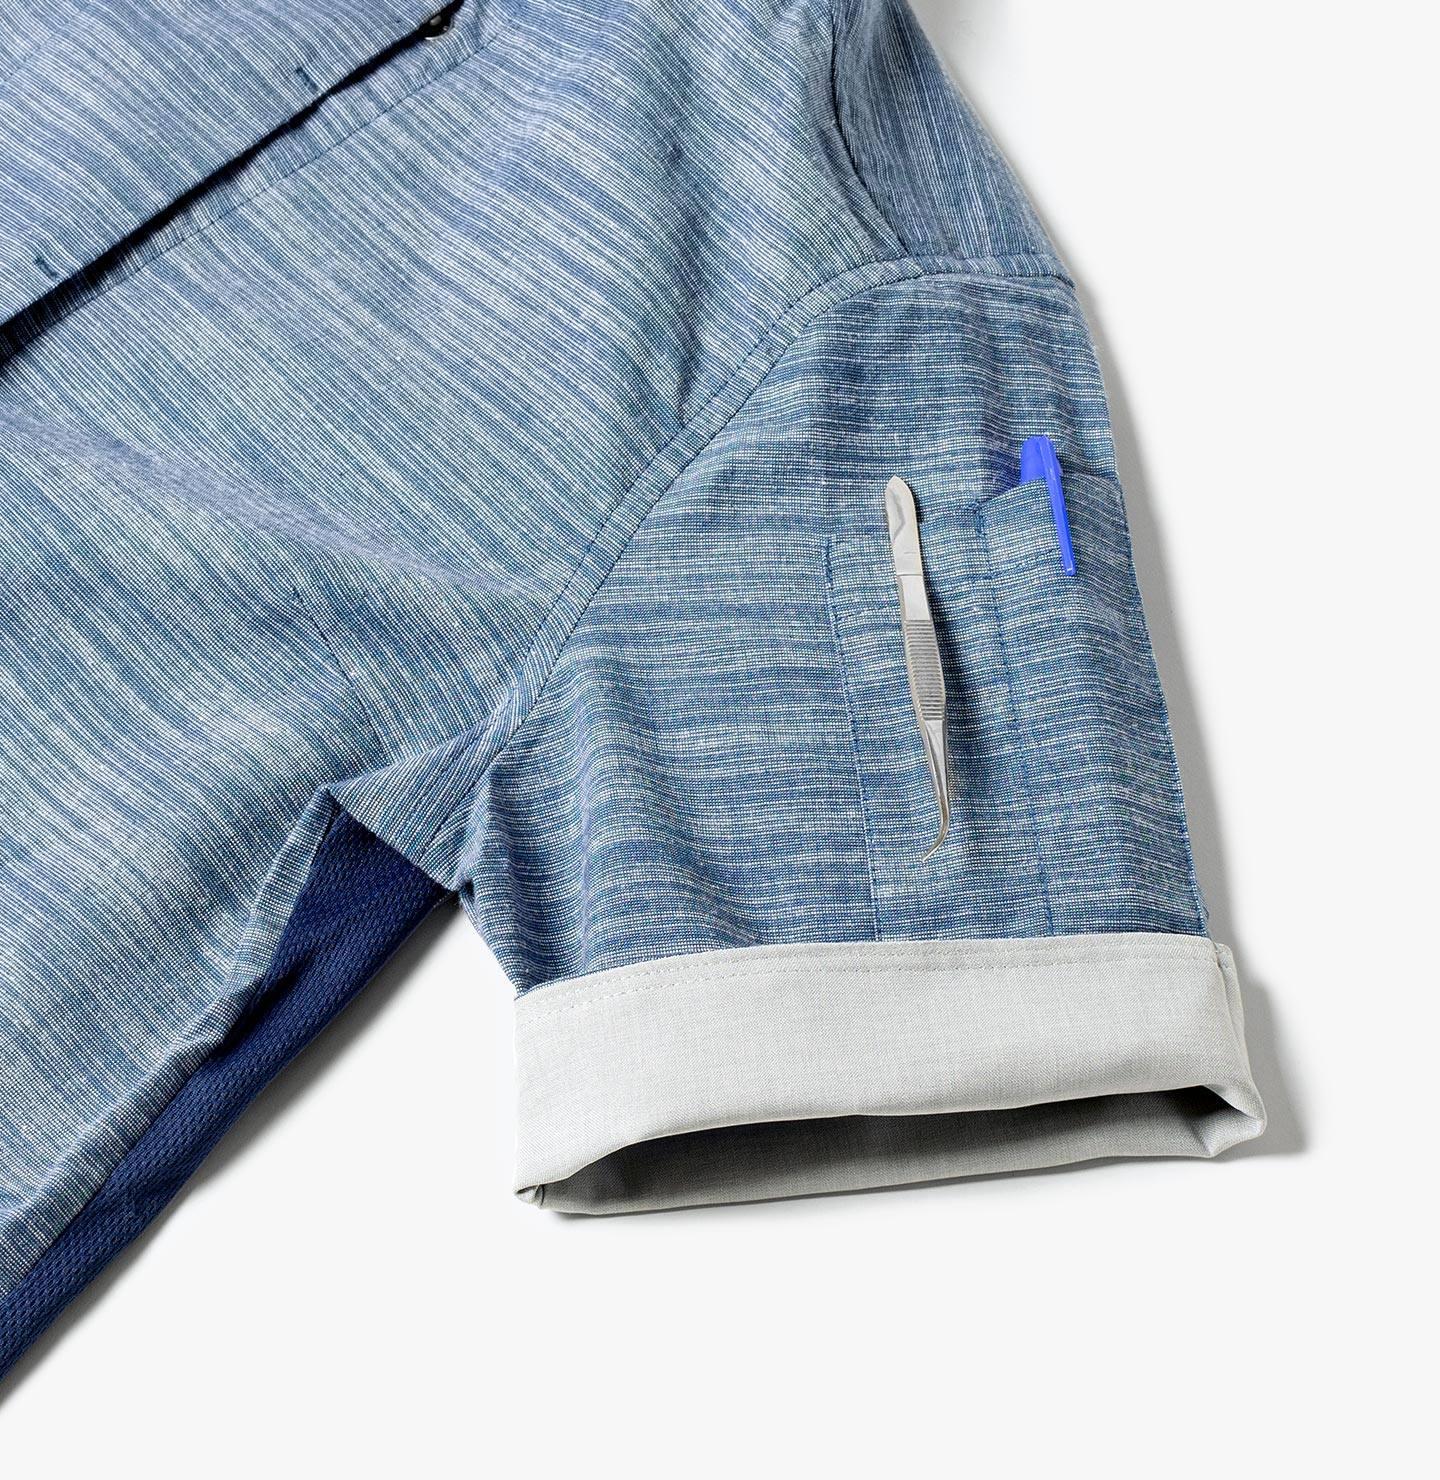 Handy sleeve pockets